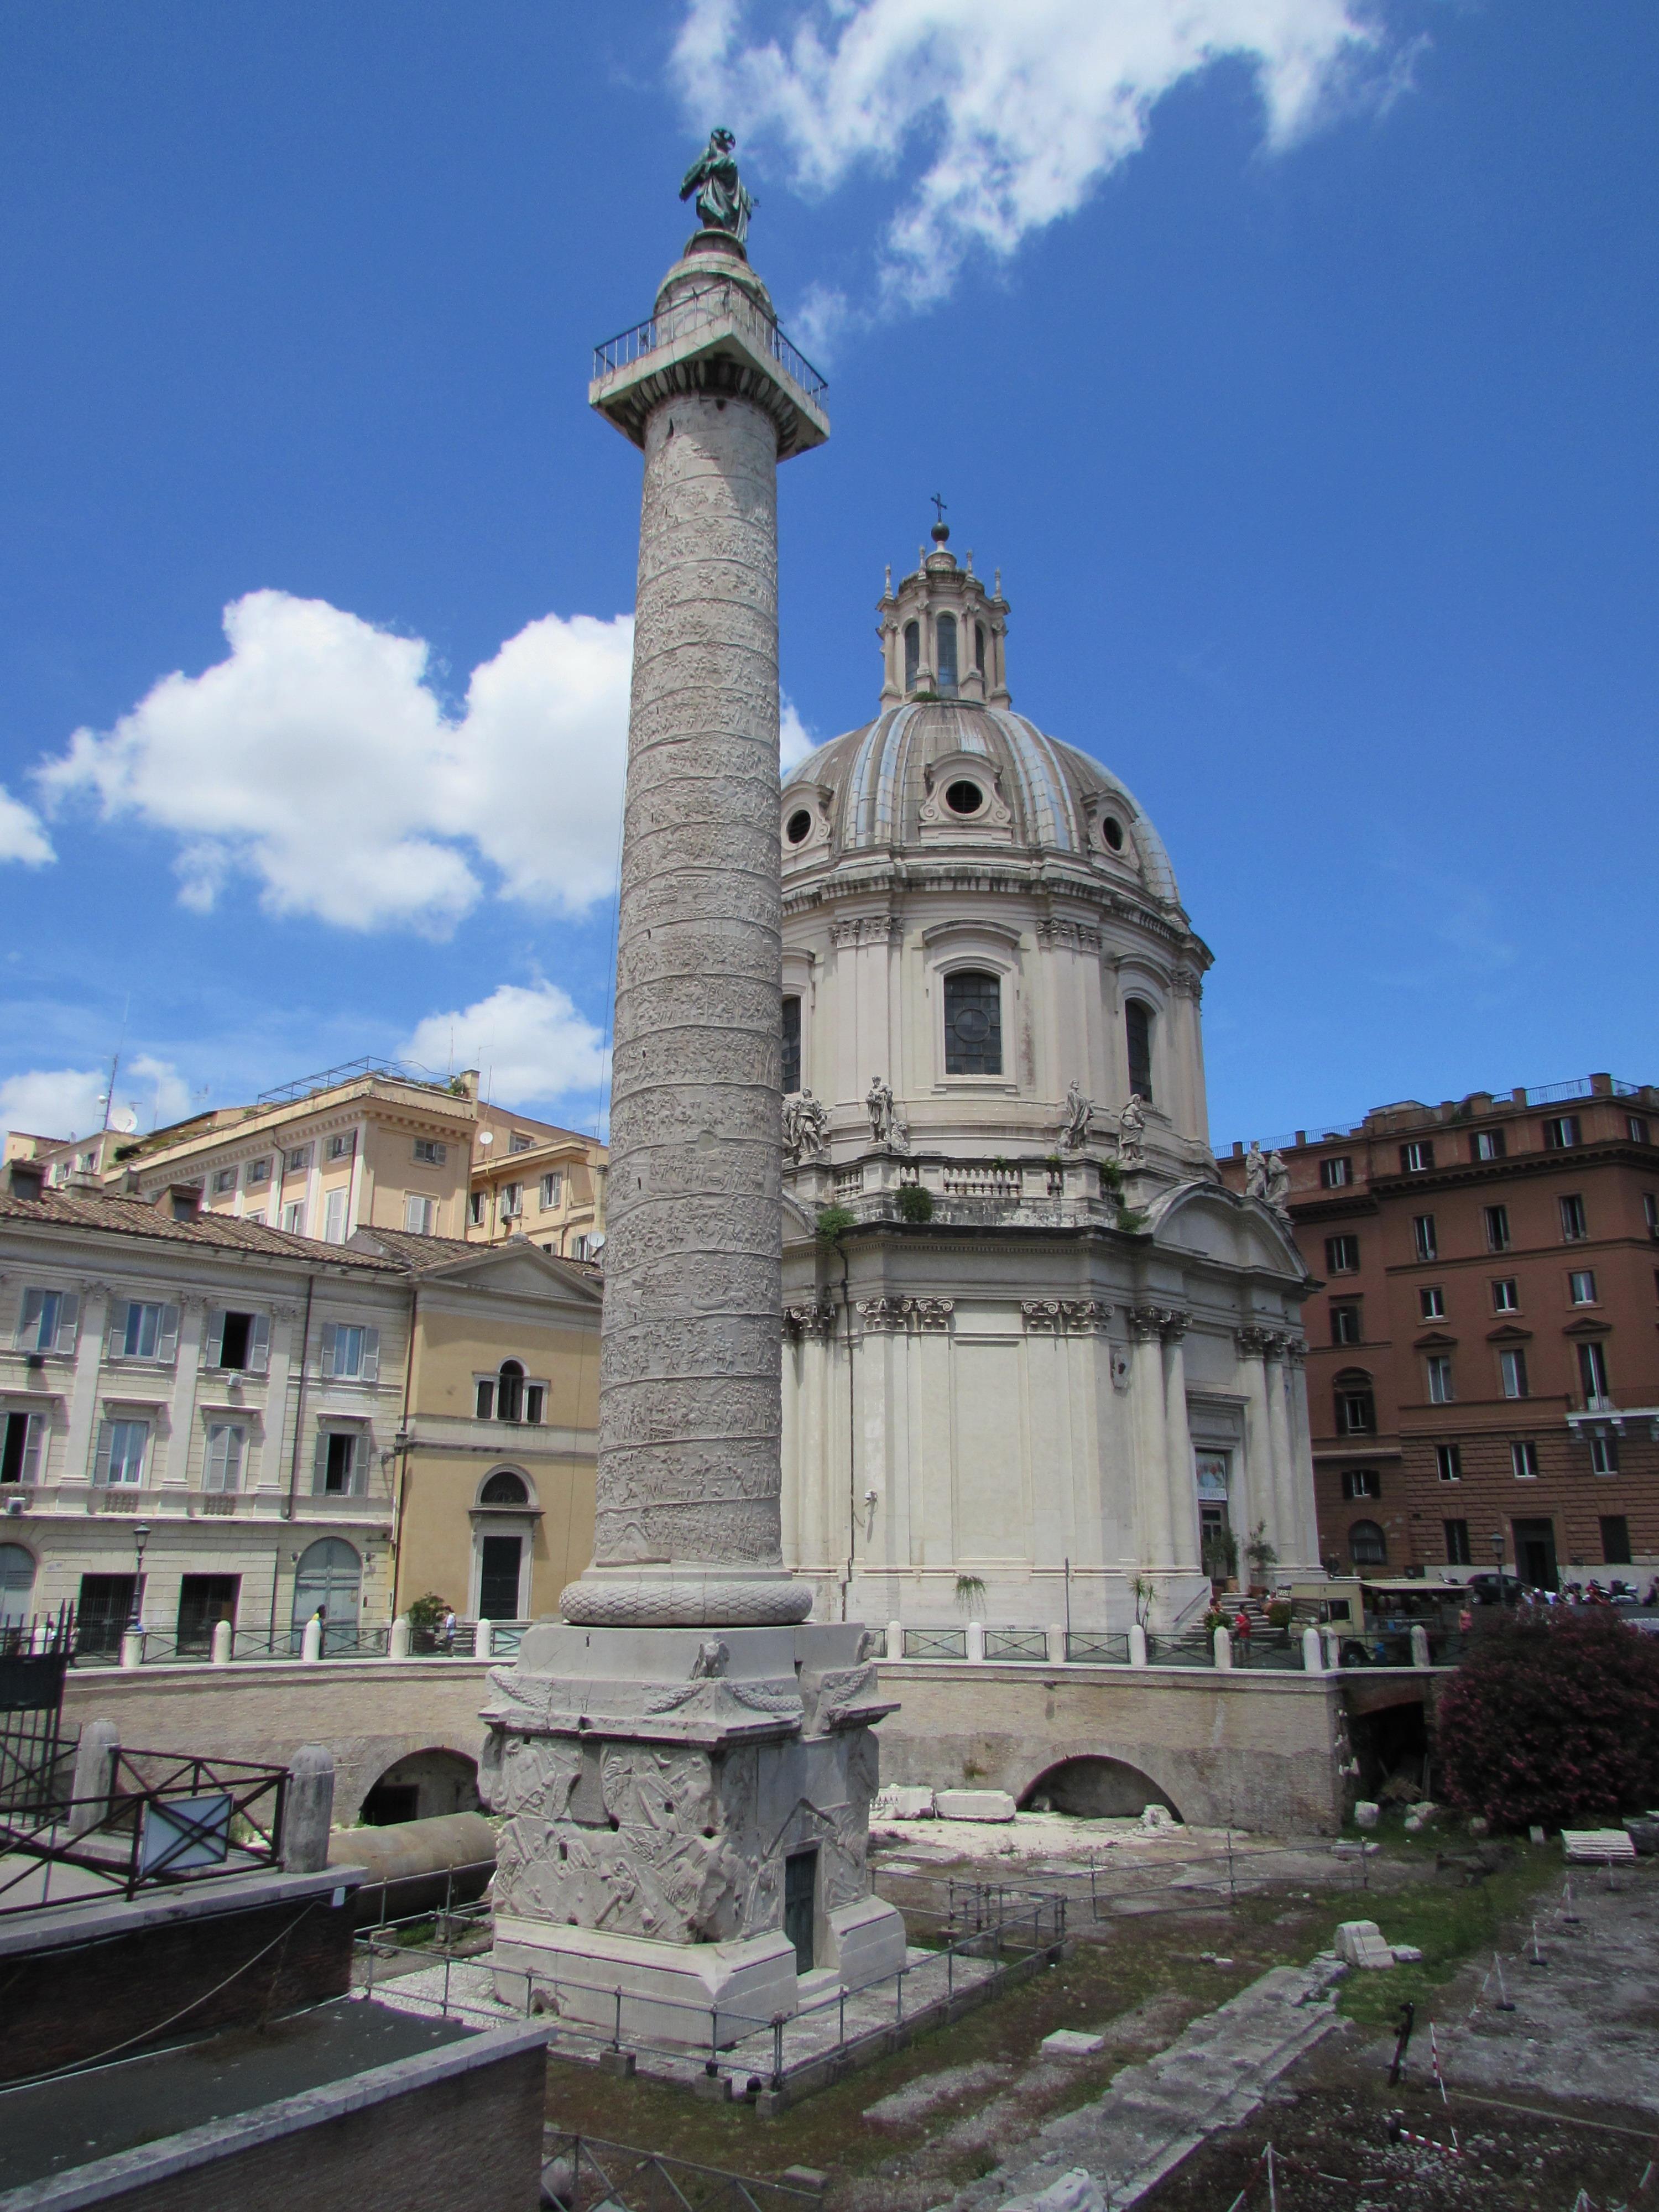 File:Columna lui Traian din Roma6.jpg - Wikimedia Commons